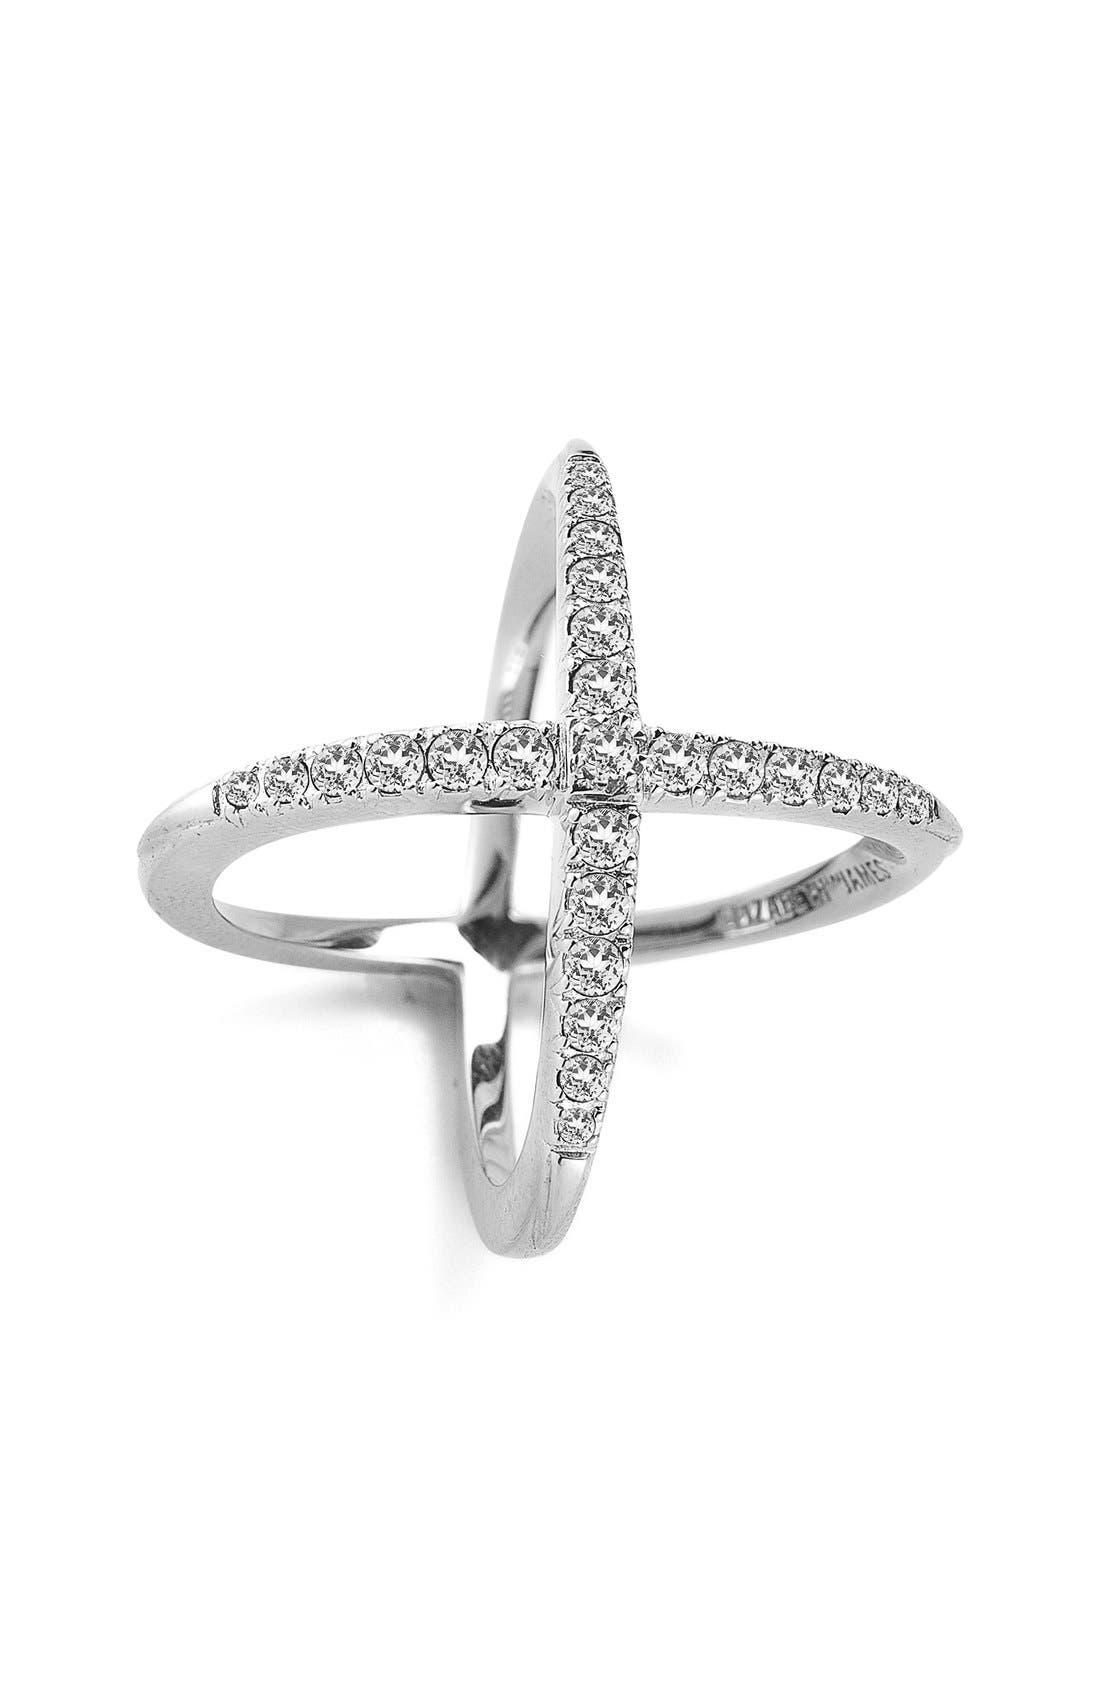 Main Image - Elizabeth and James 'Windrose' Pavé White Topaz Ring